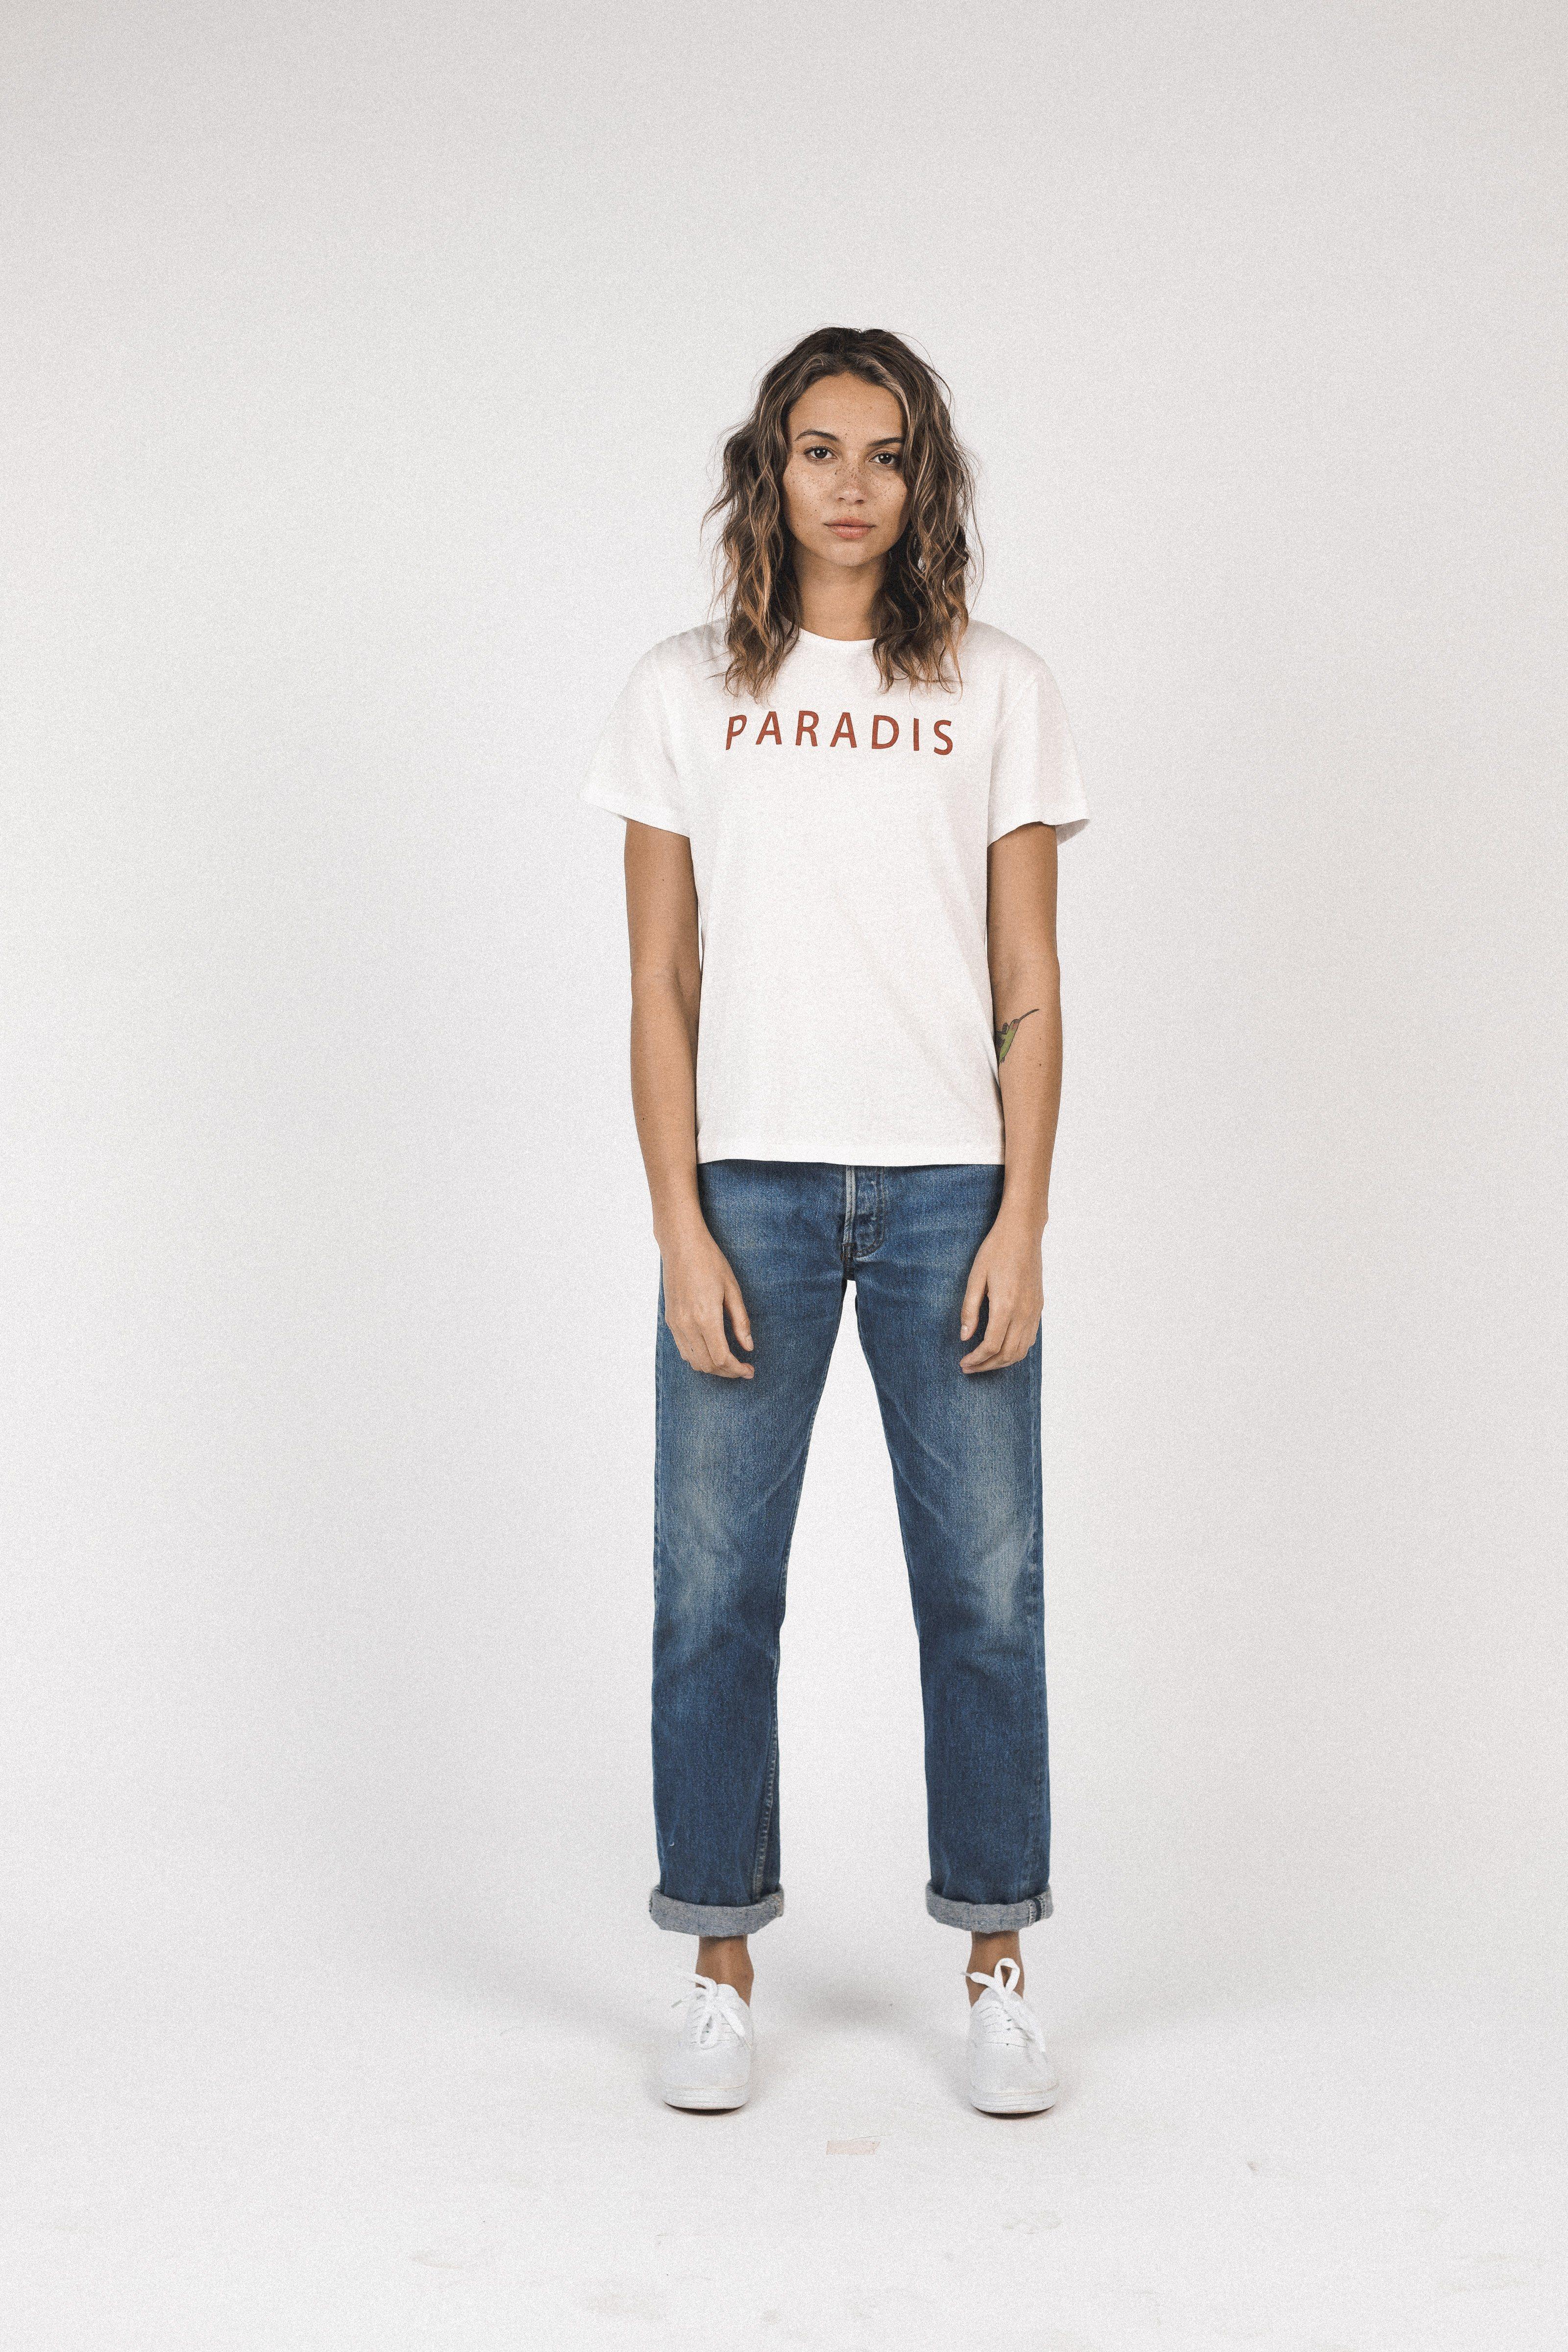 Jett T-Shirt RED WHITE PARADIS by Trovata - 2